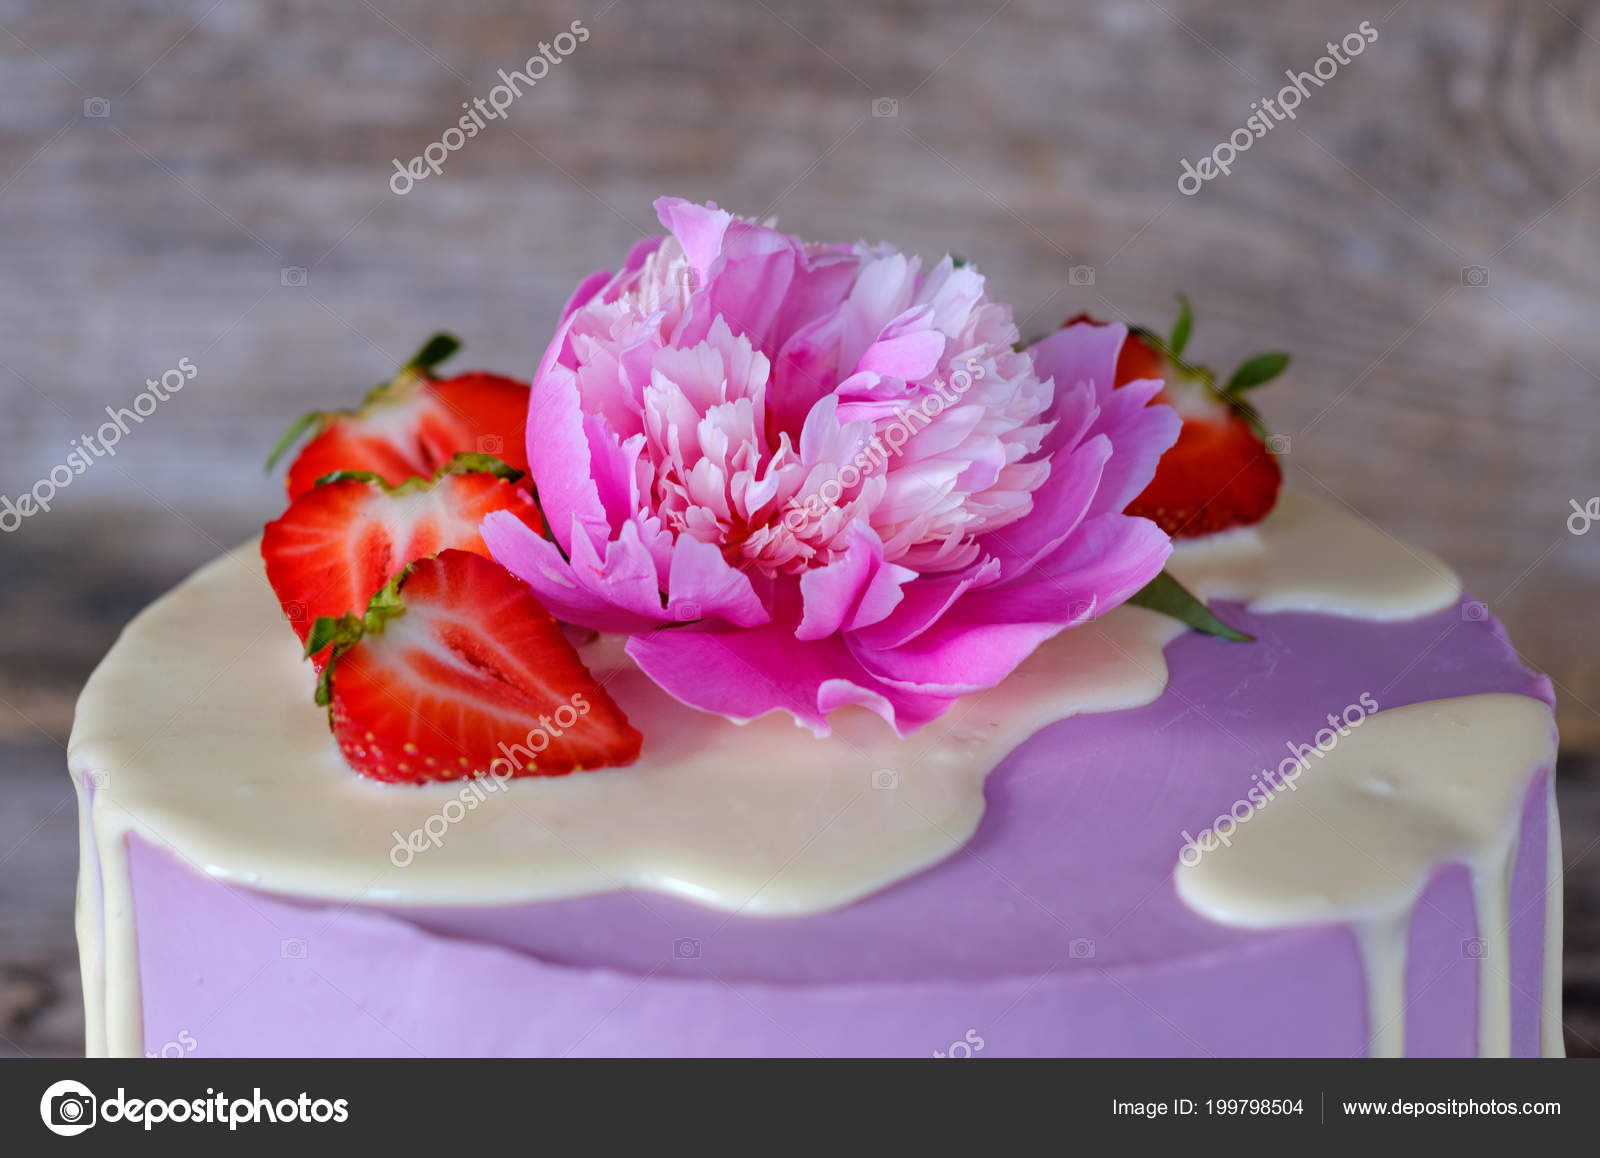 Beautiful Homemade Cake Purple Cheese Cream Decorated Live Pink Peony Stock Photo